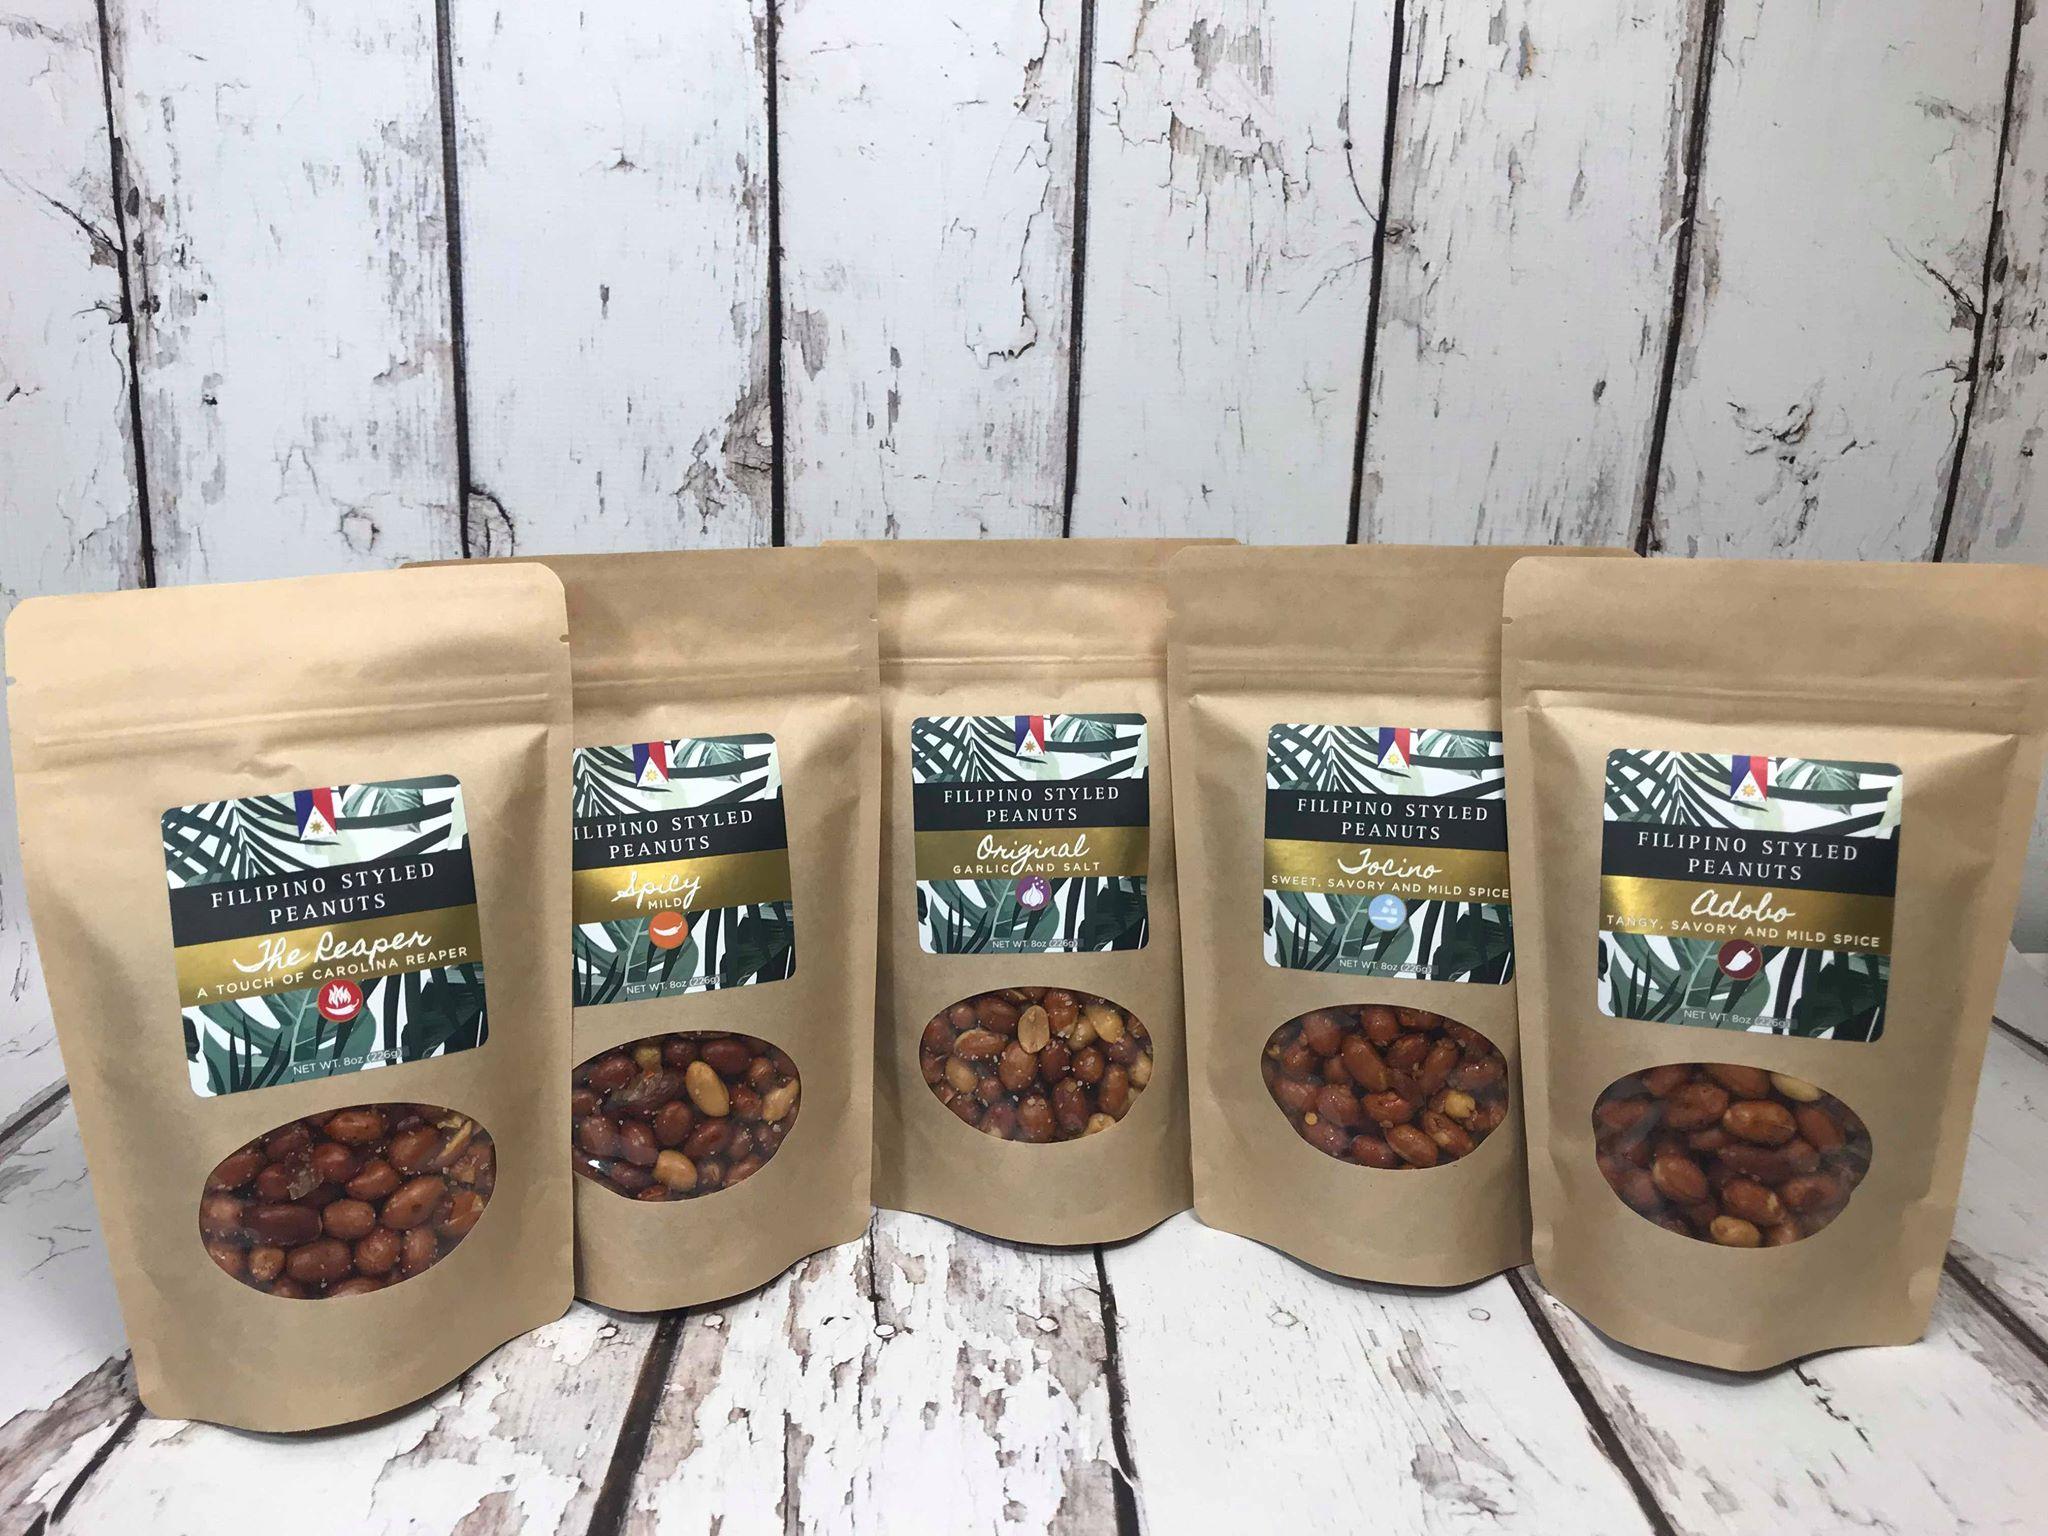 Filipino Styled Peanuts